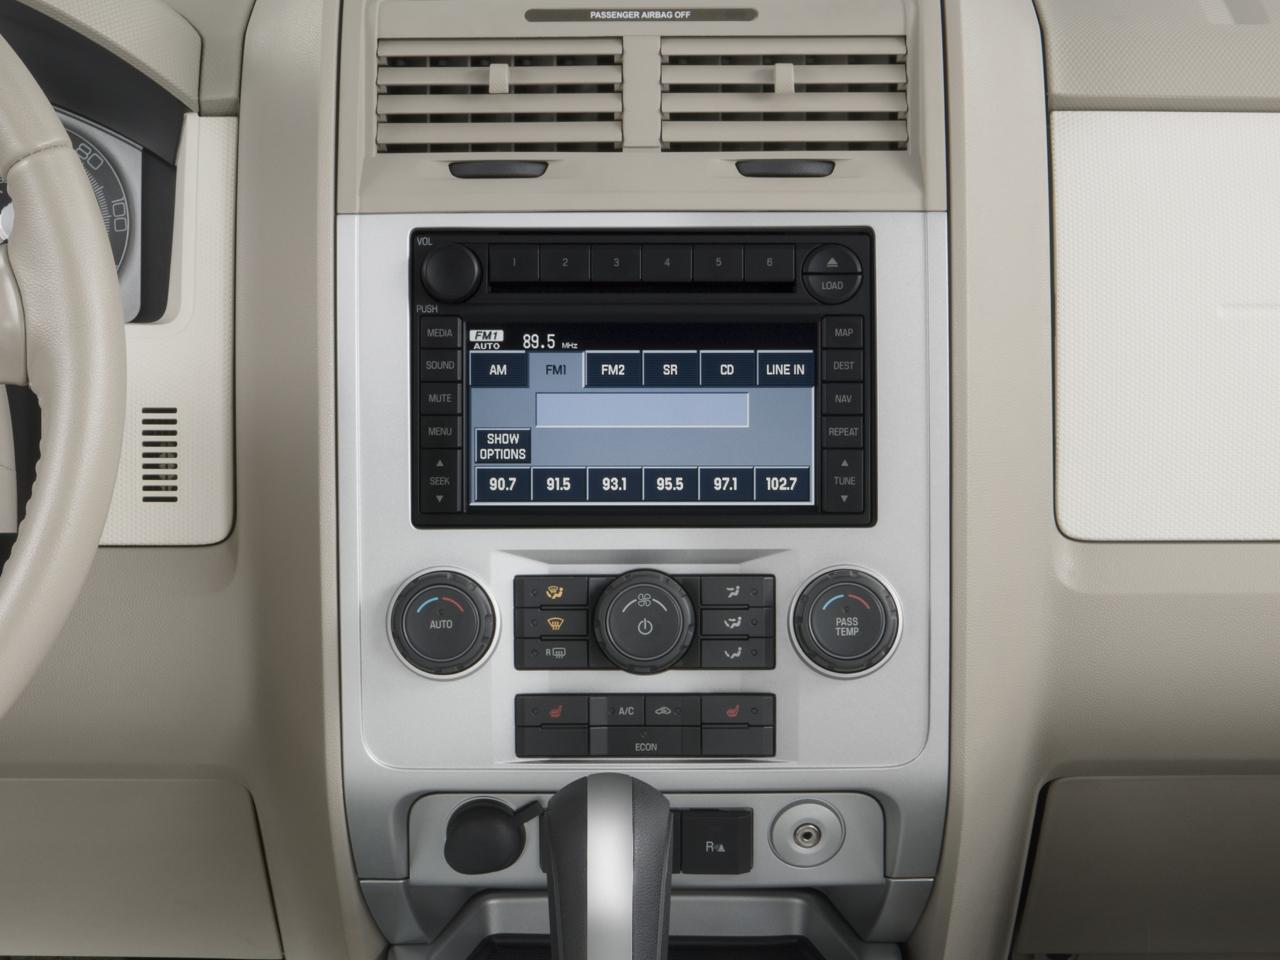 2009 Mercury Mariner Hybrid 4wd Suv Review 2008 Mazda Tribute Fuse Box In Car 51 75